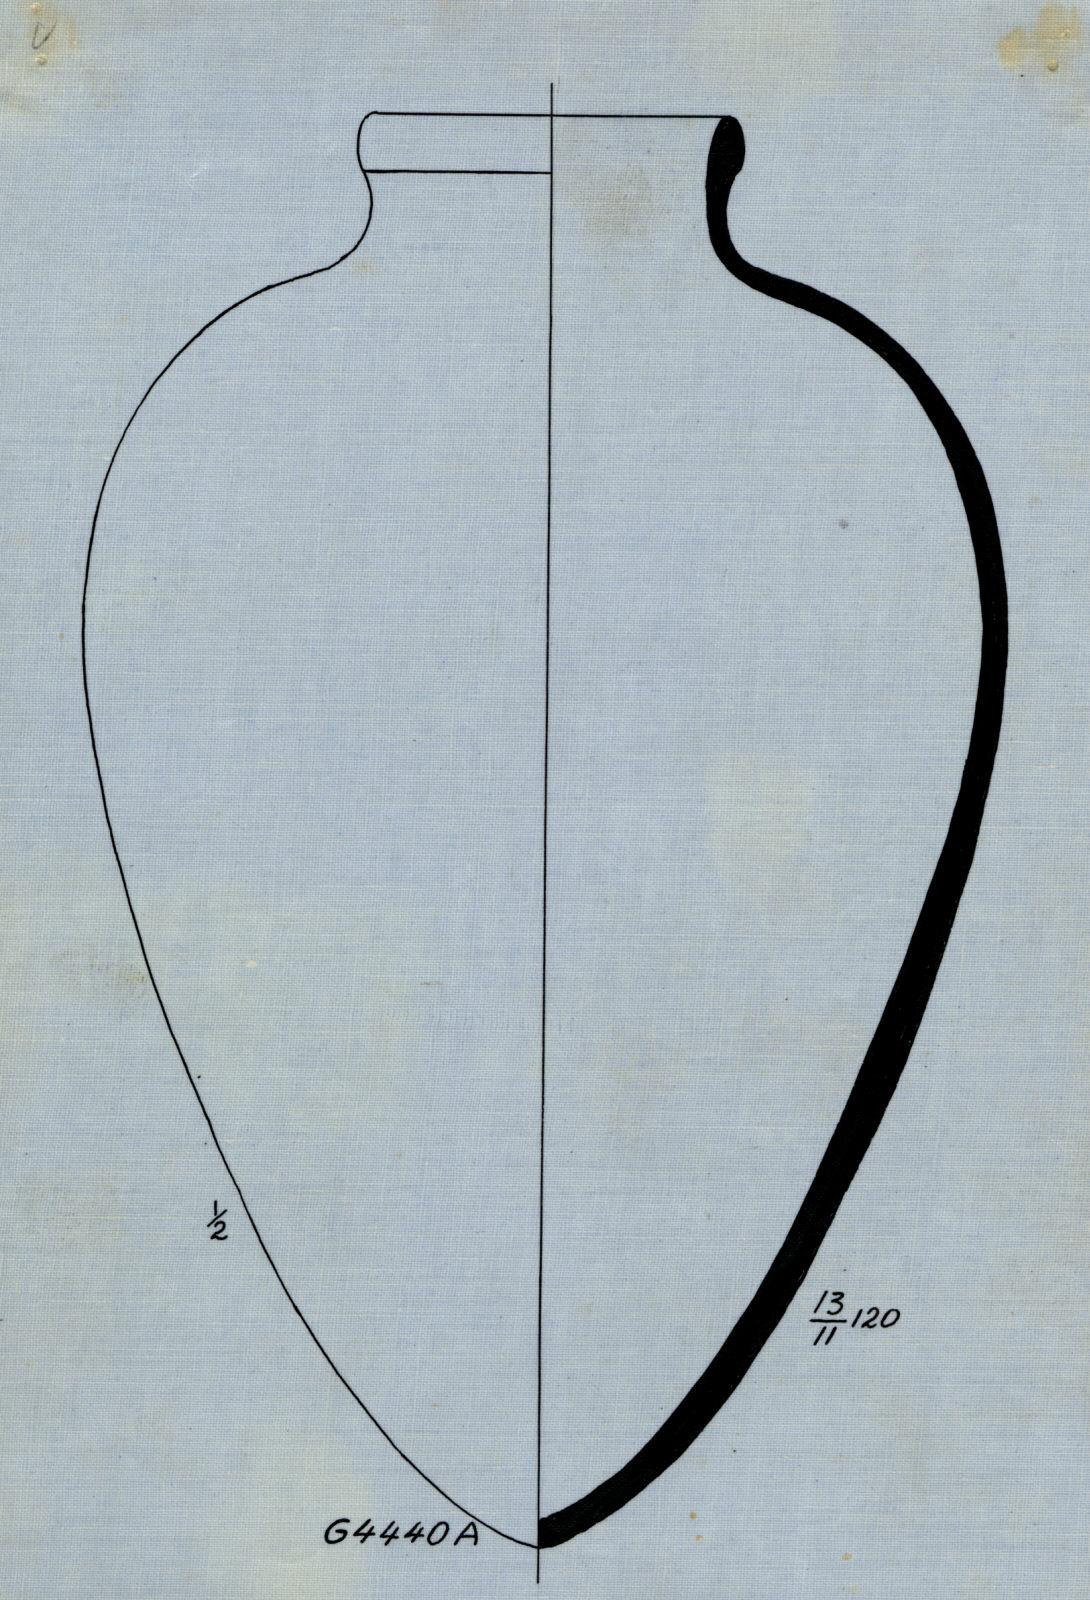 Drawings: G 4440, Shaft A: pottery, jar